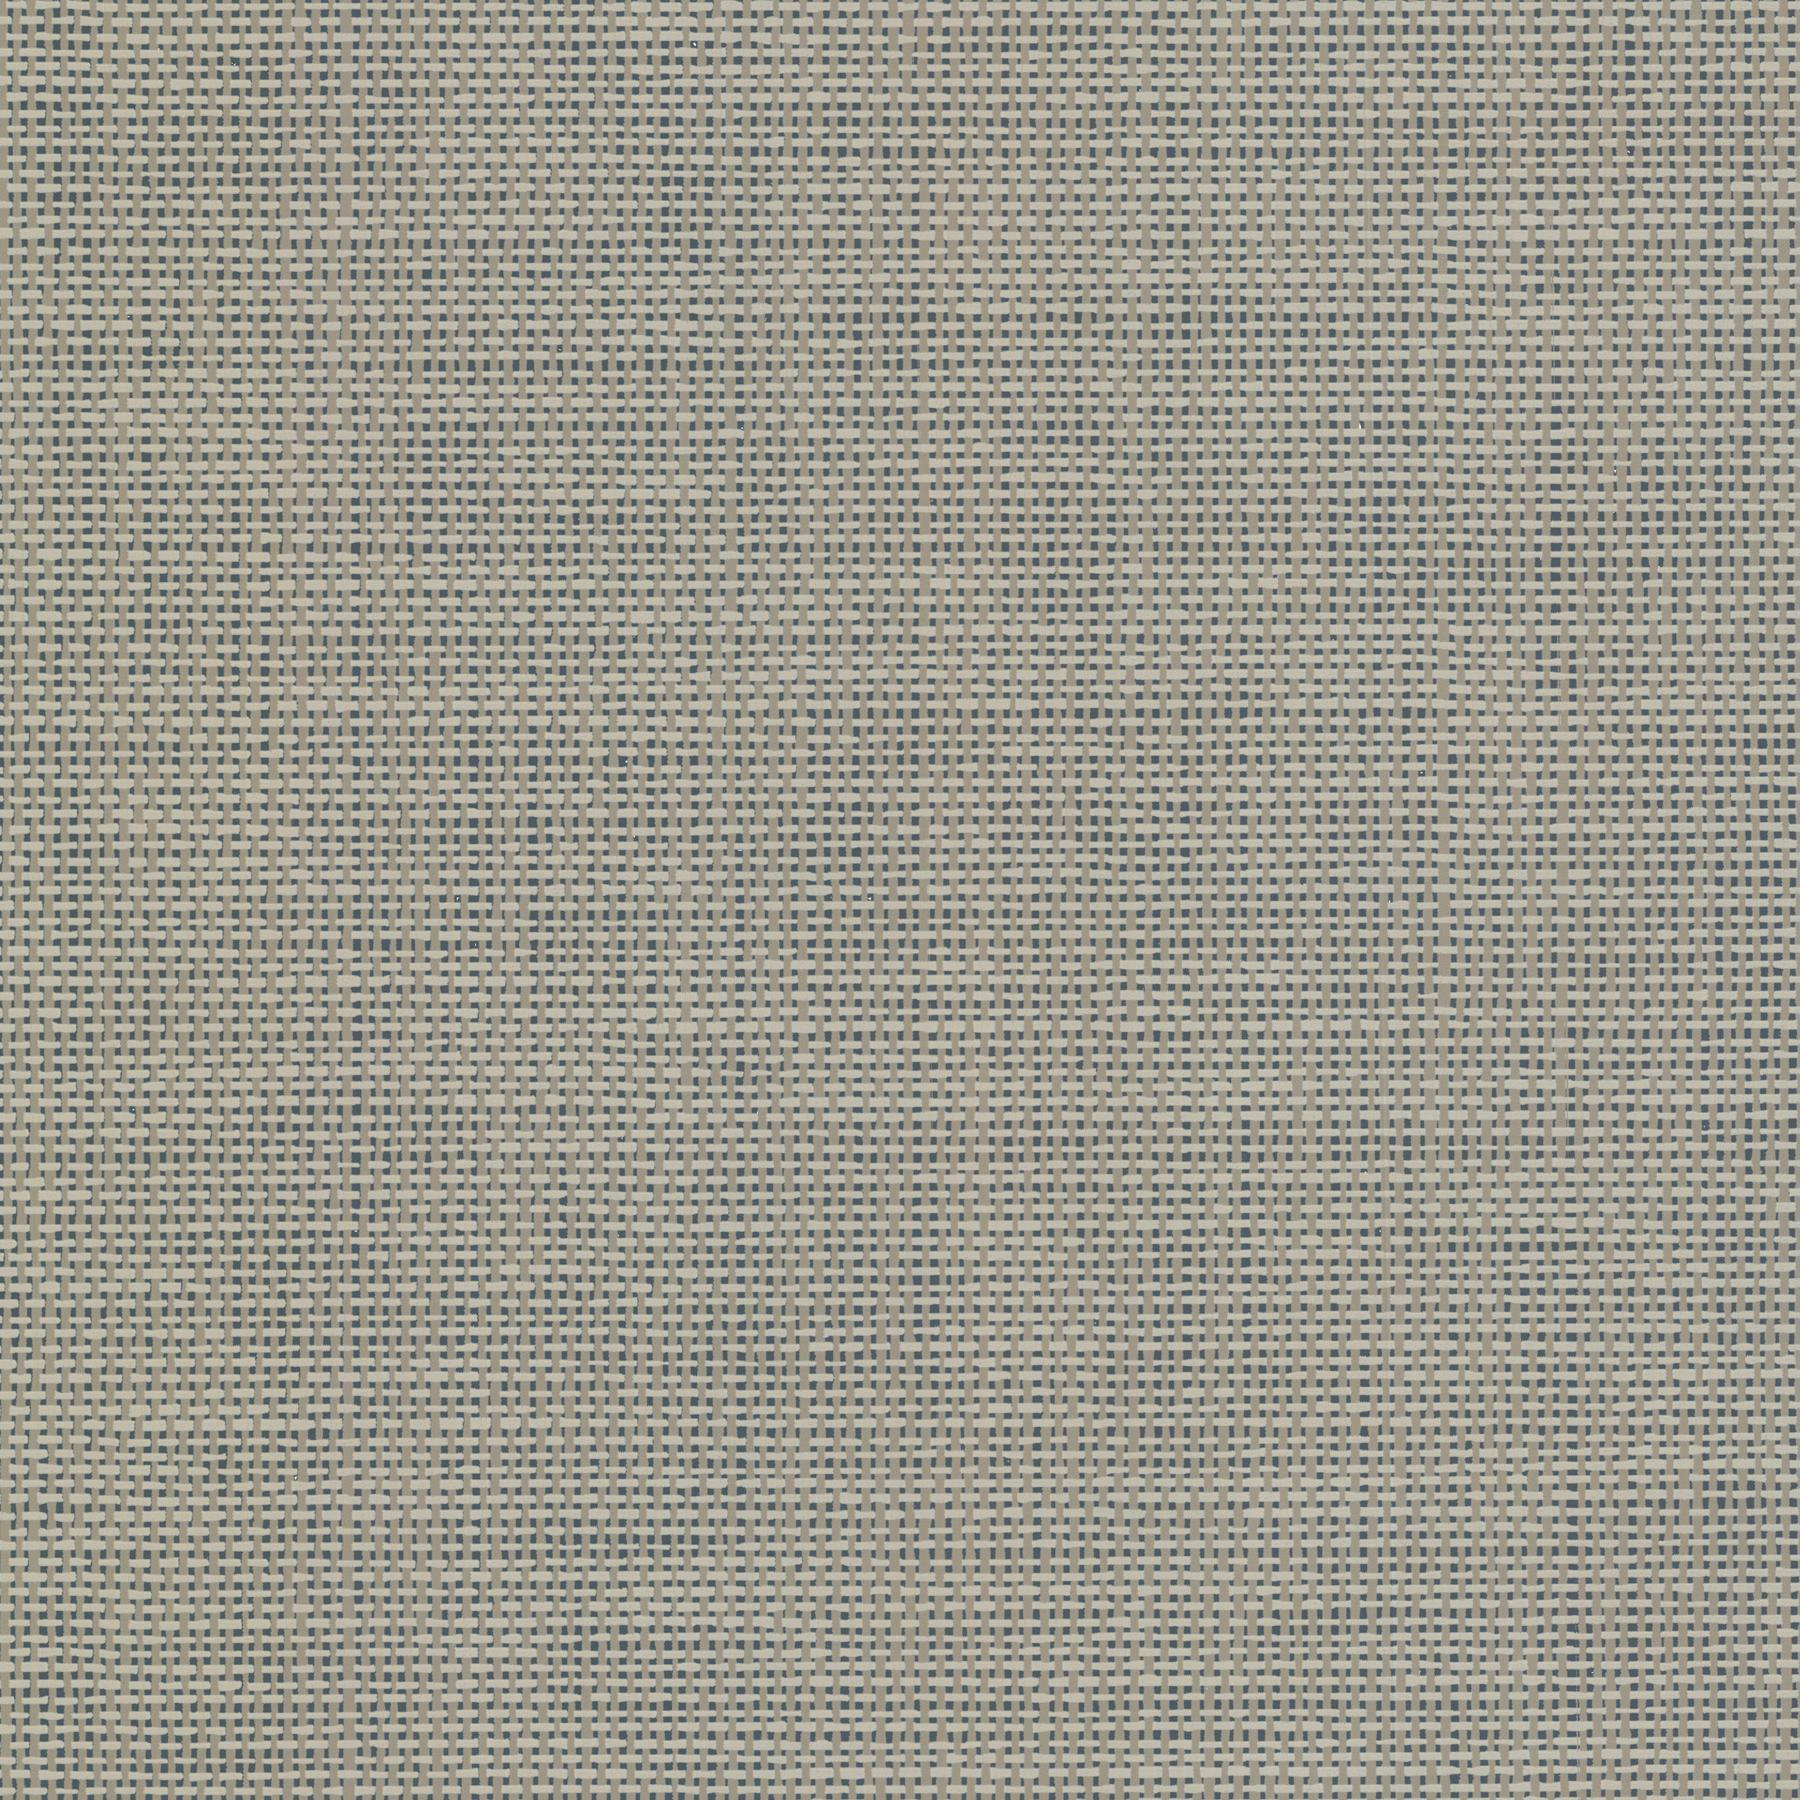 Brewster Wallpaper David Blue Basket Weave Texture ...